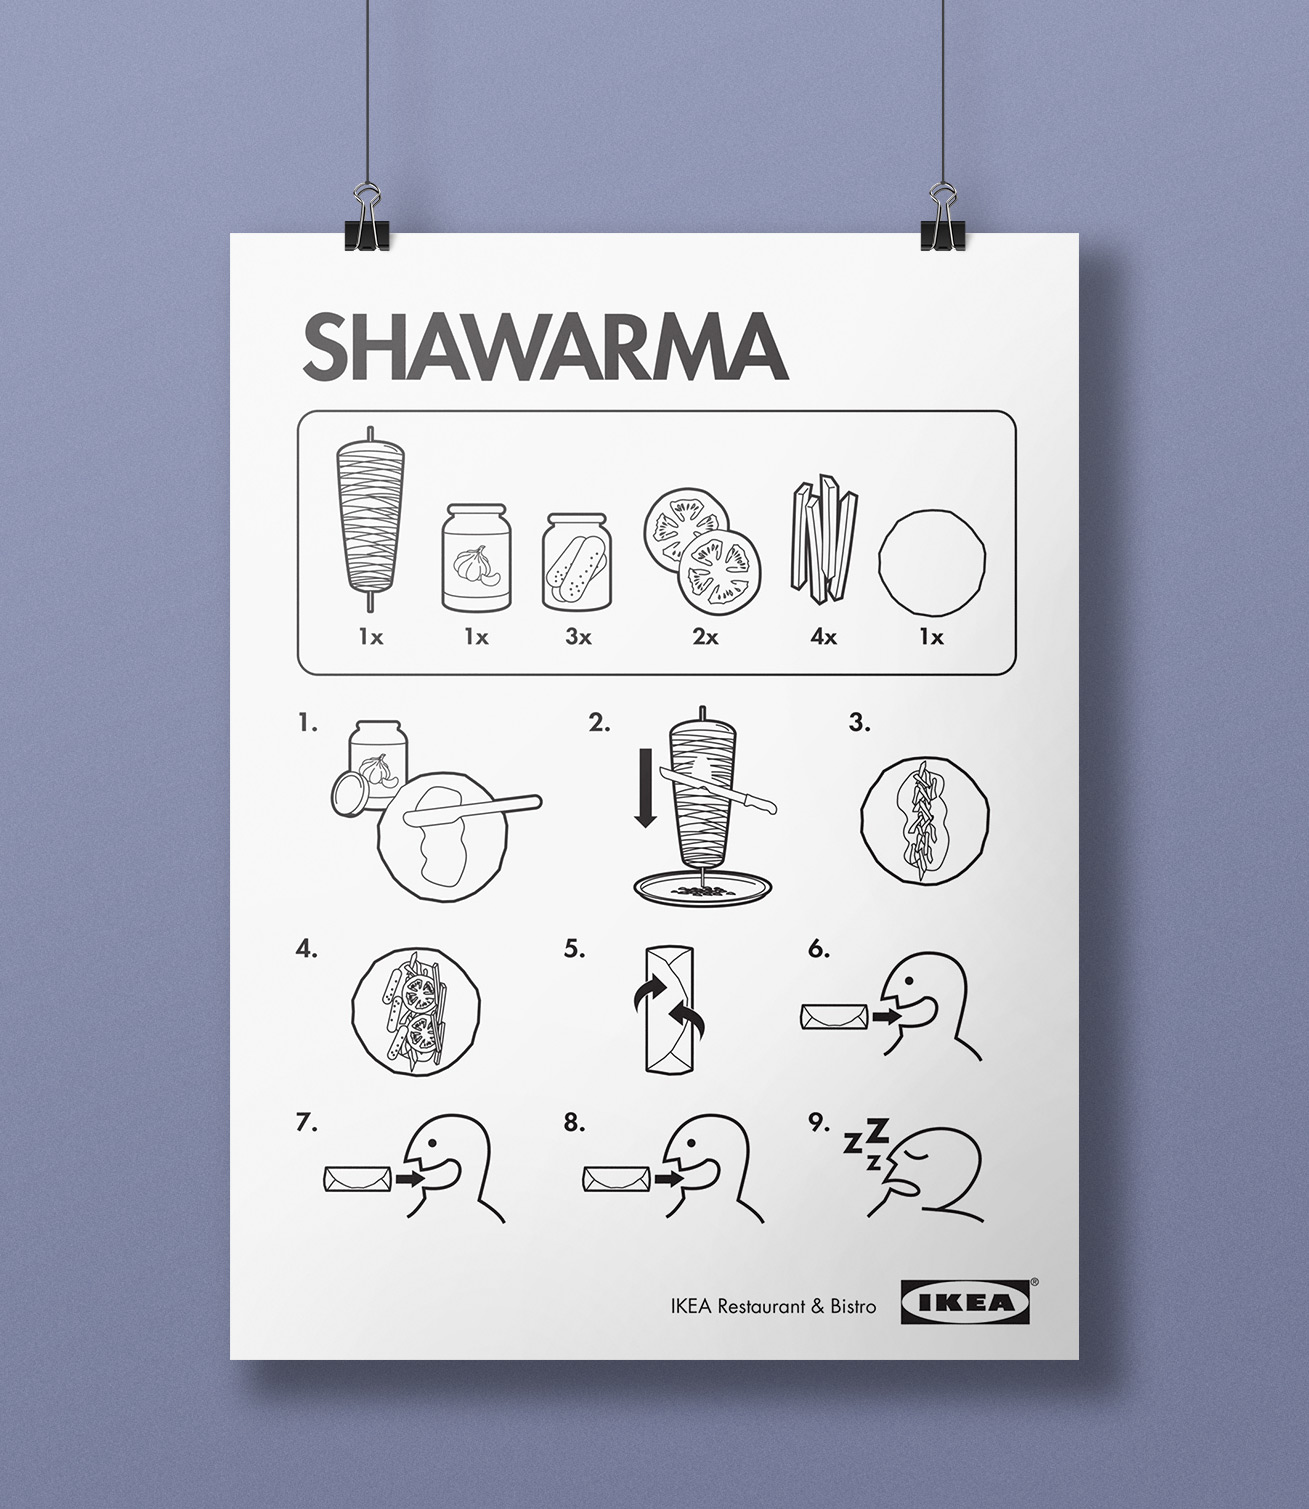 IKEA-shawarma-in-situ2